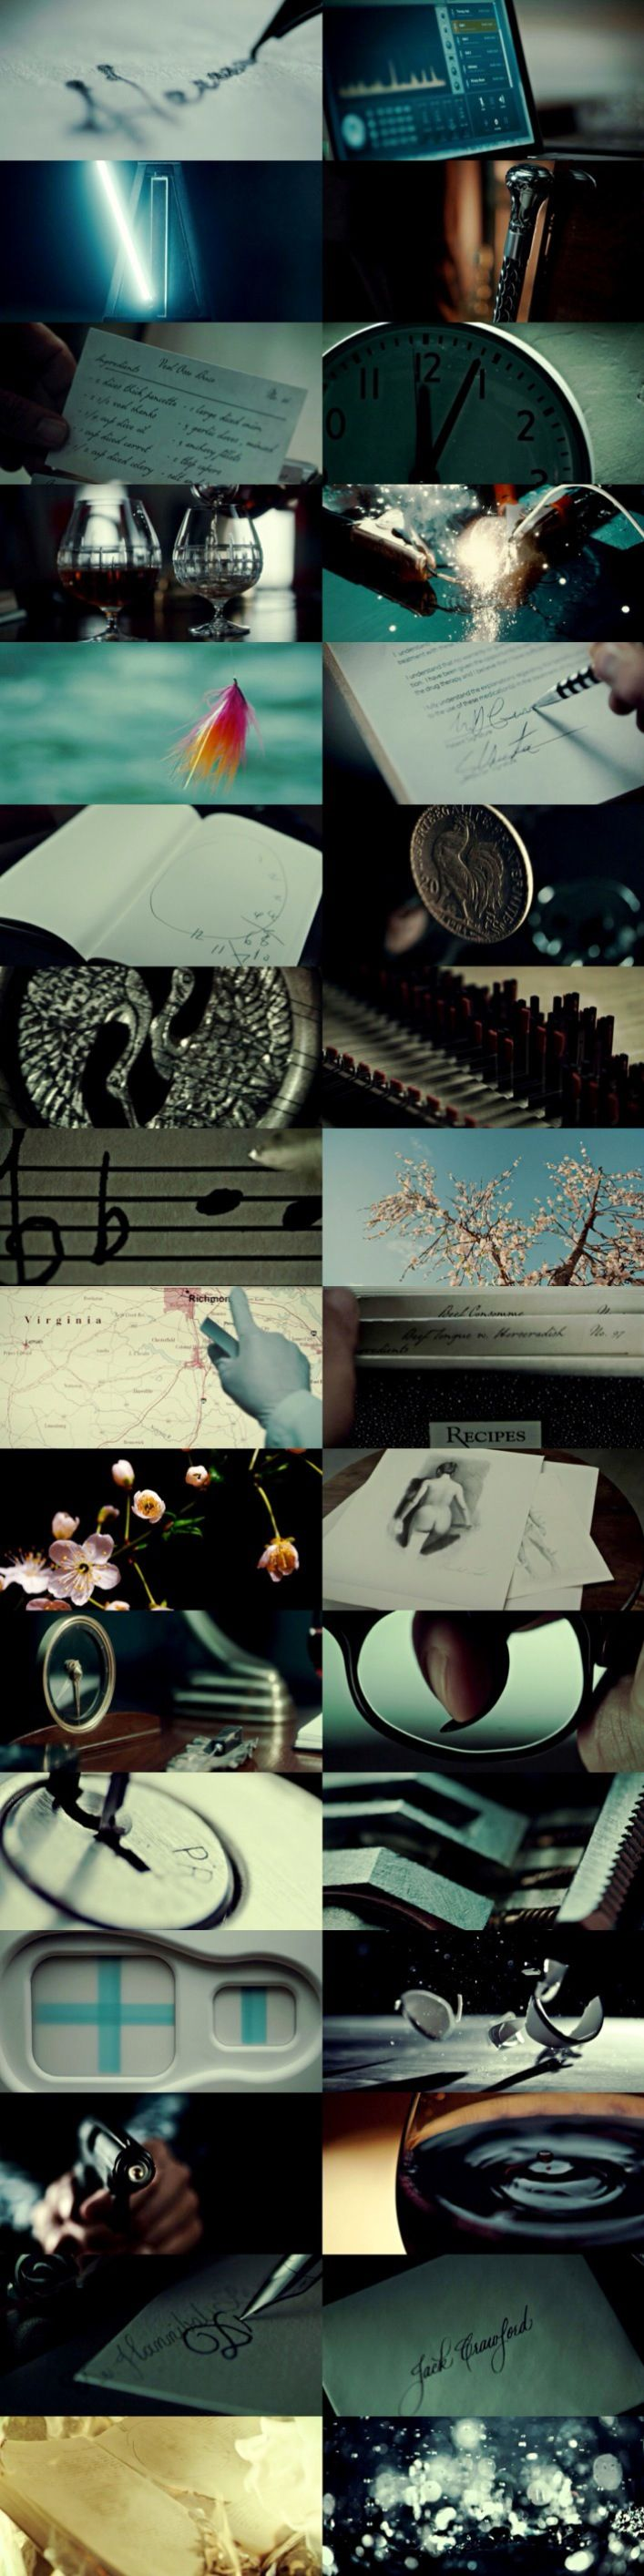 Hannibal Season 2 + Beautiful Details